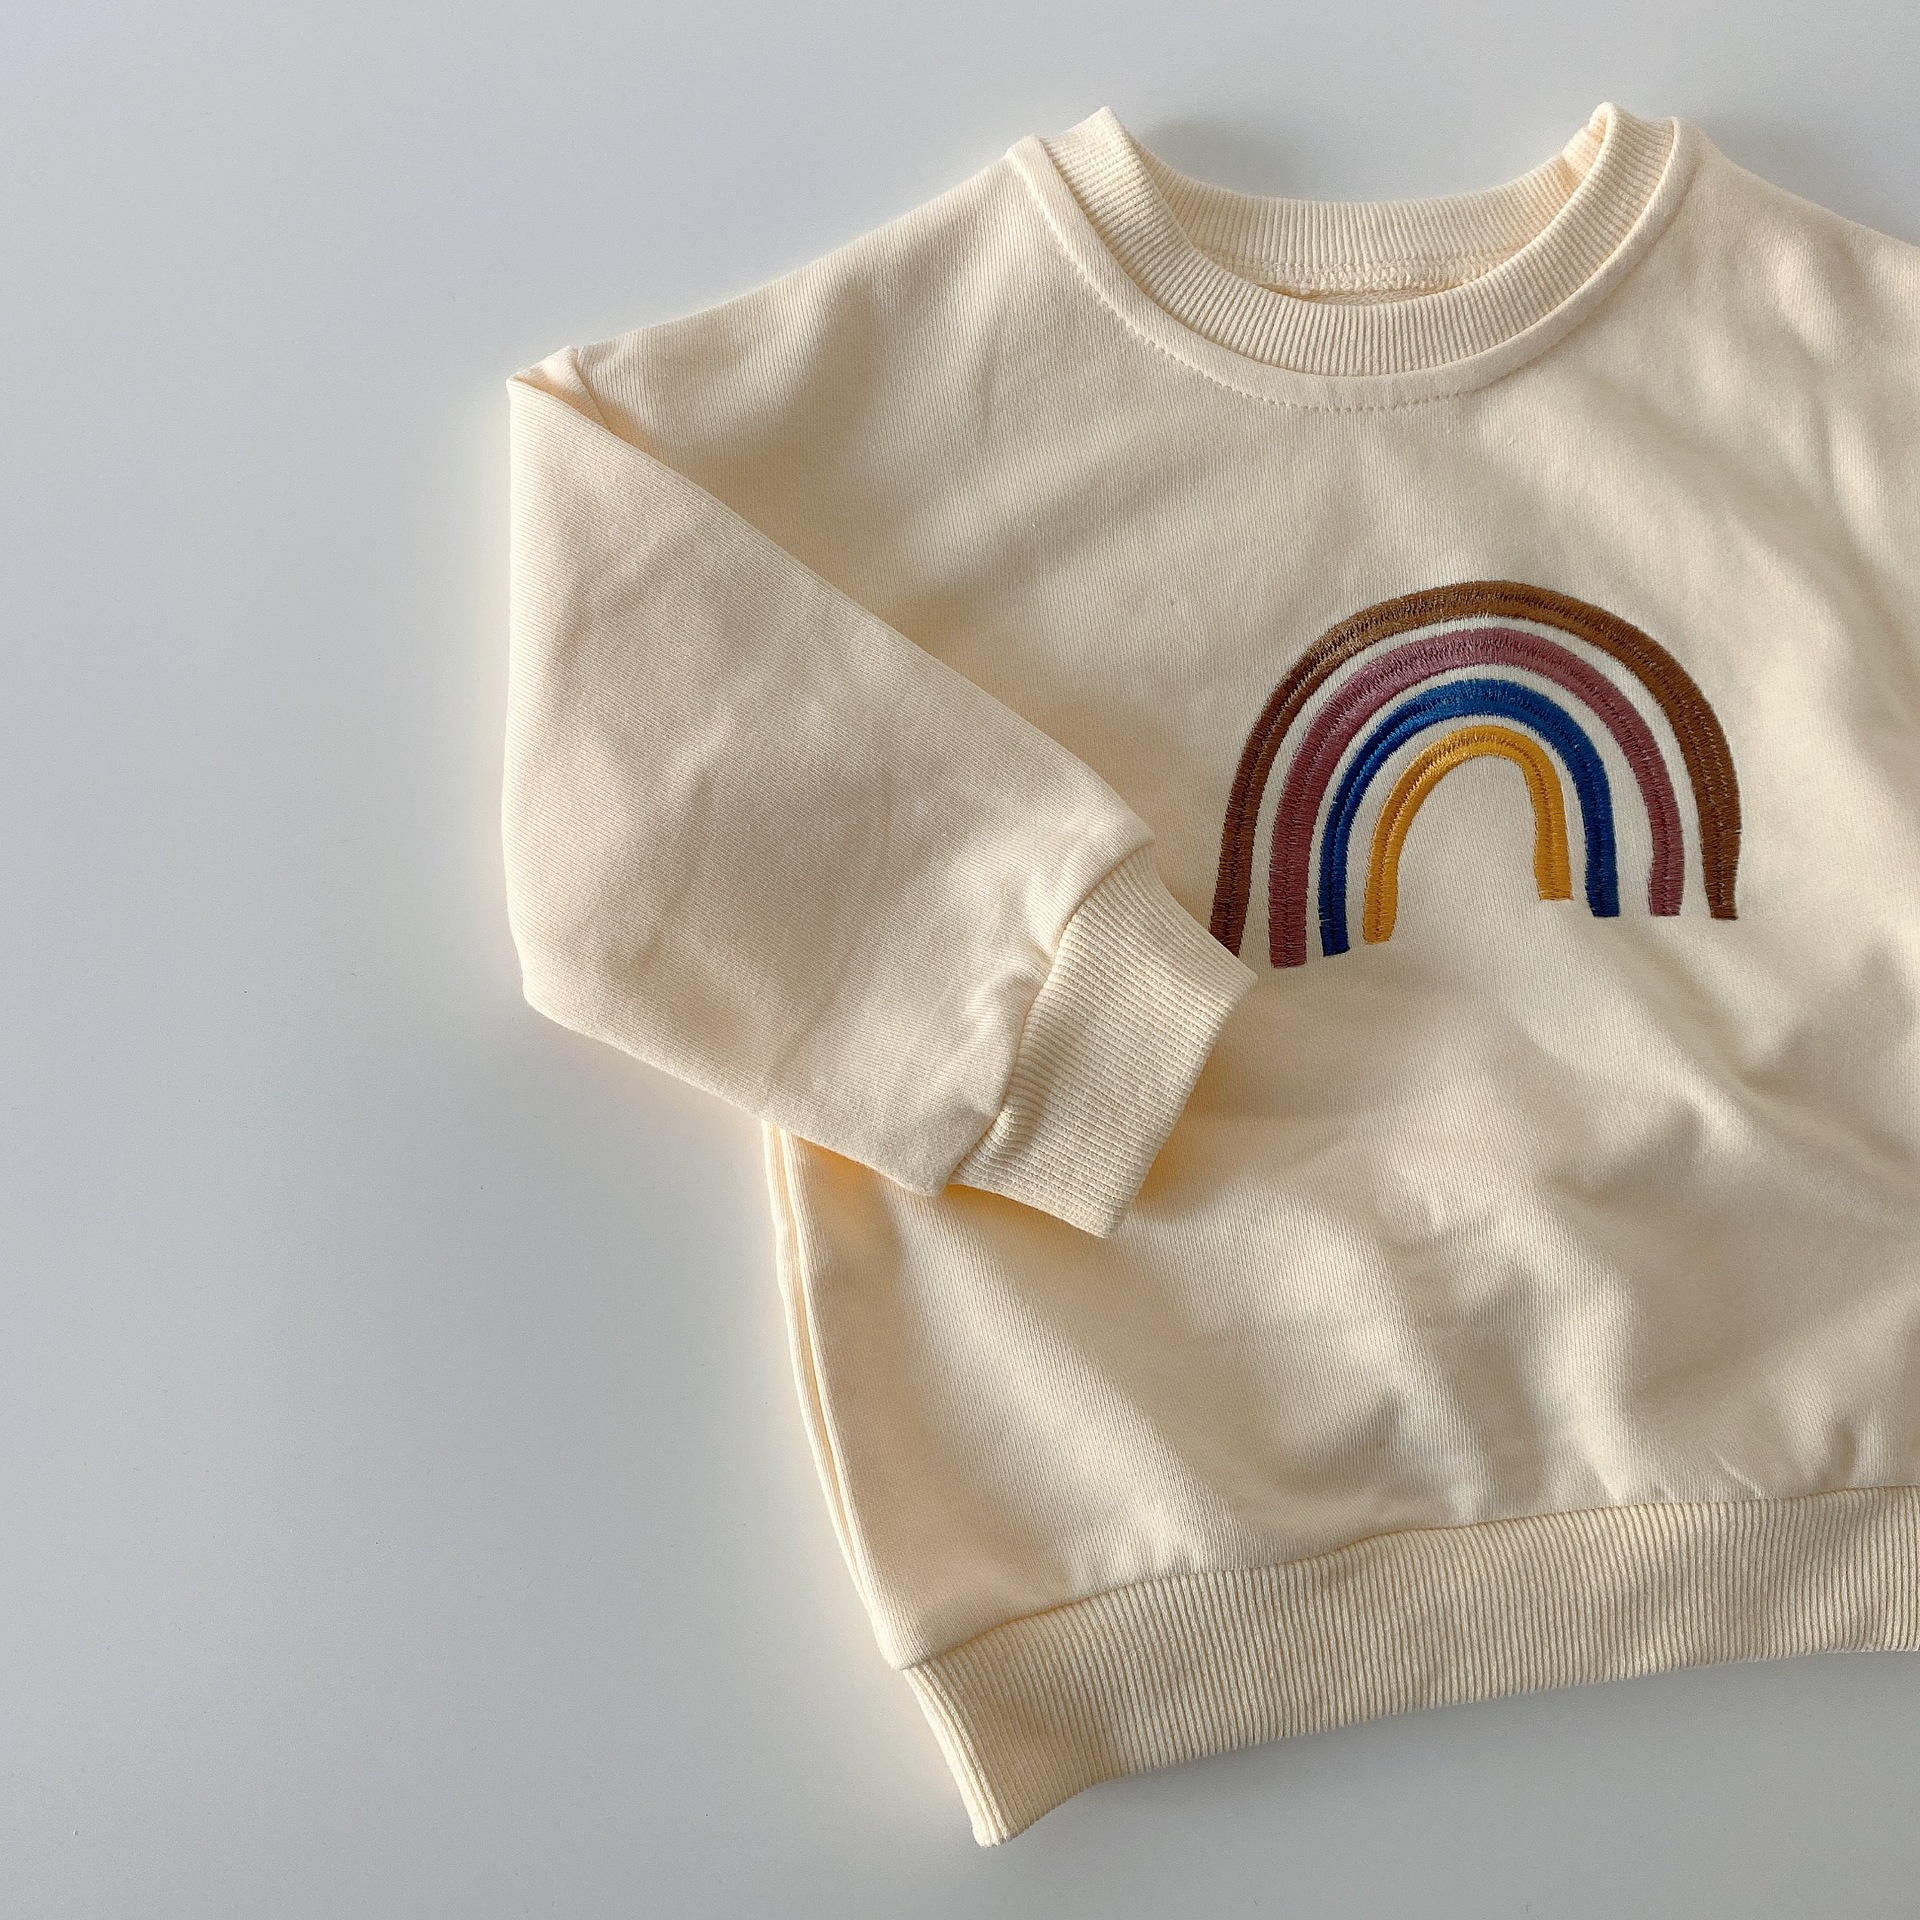 Autumn Baby Girls Embroidery Rainbow Sweatshirts Long Sleeve Tops Kids Toddler Boys Pullover Sweatshirt Rainbow T-shirt Clothes 4